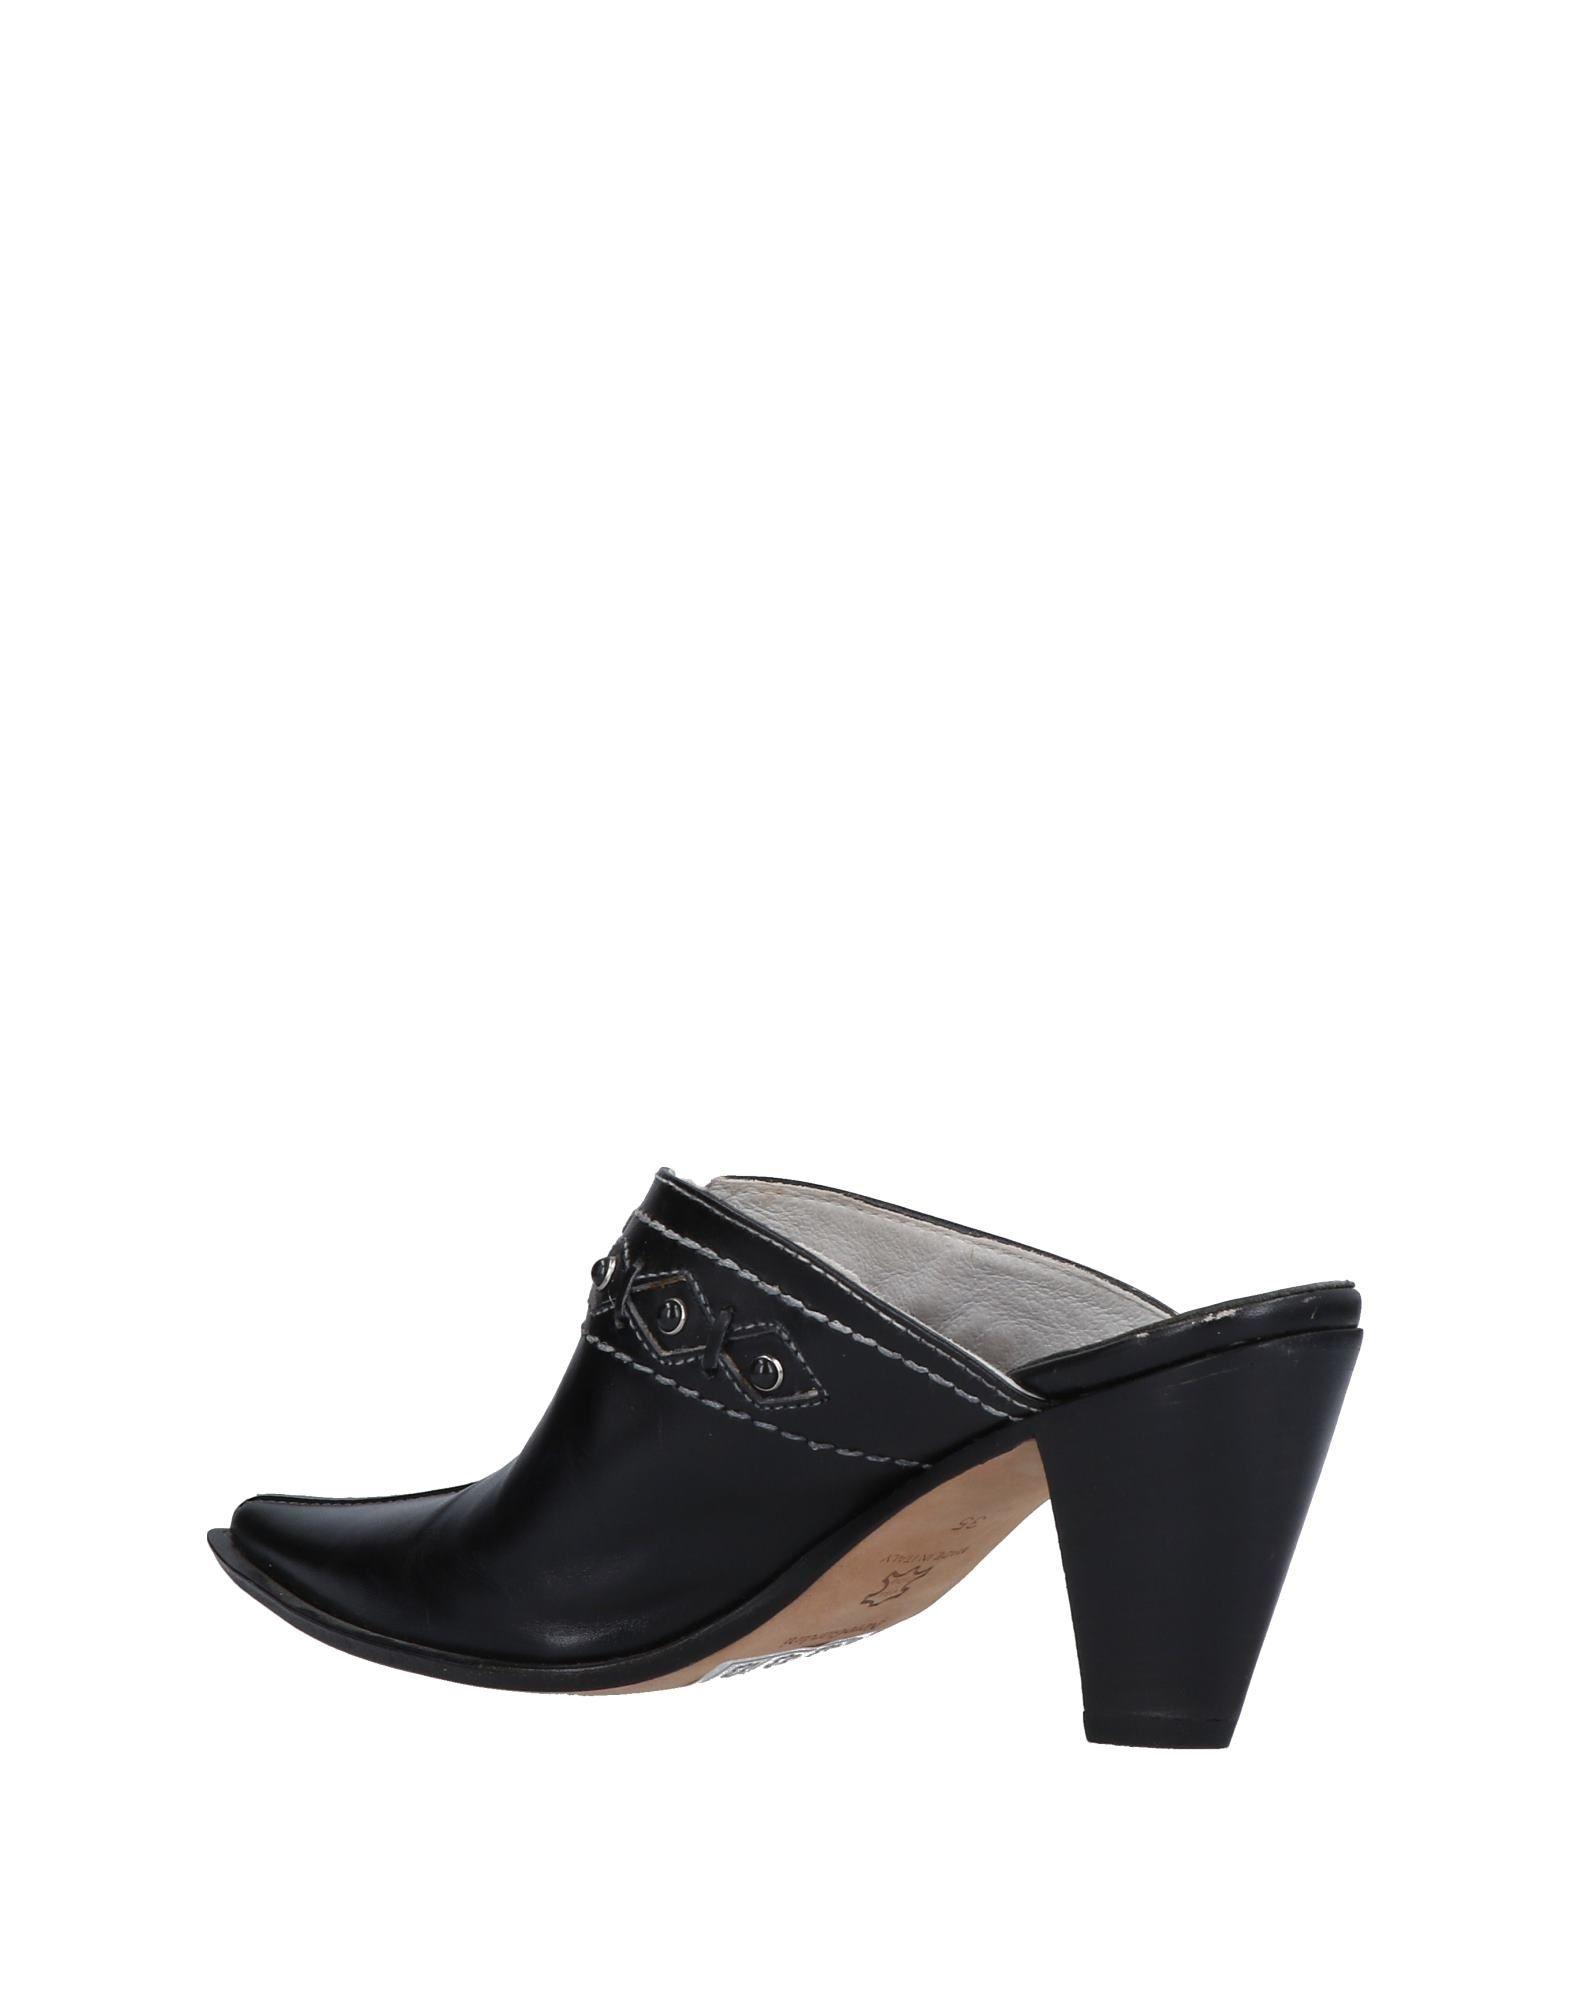 Stilvolle billige Schuhe Nero Giardini 11503506BK Pantoletten Damen  11503506BK Giardini 56ce45